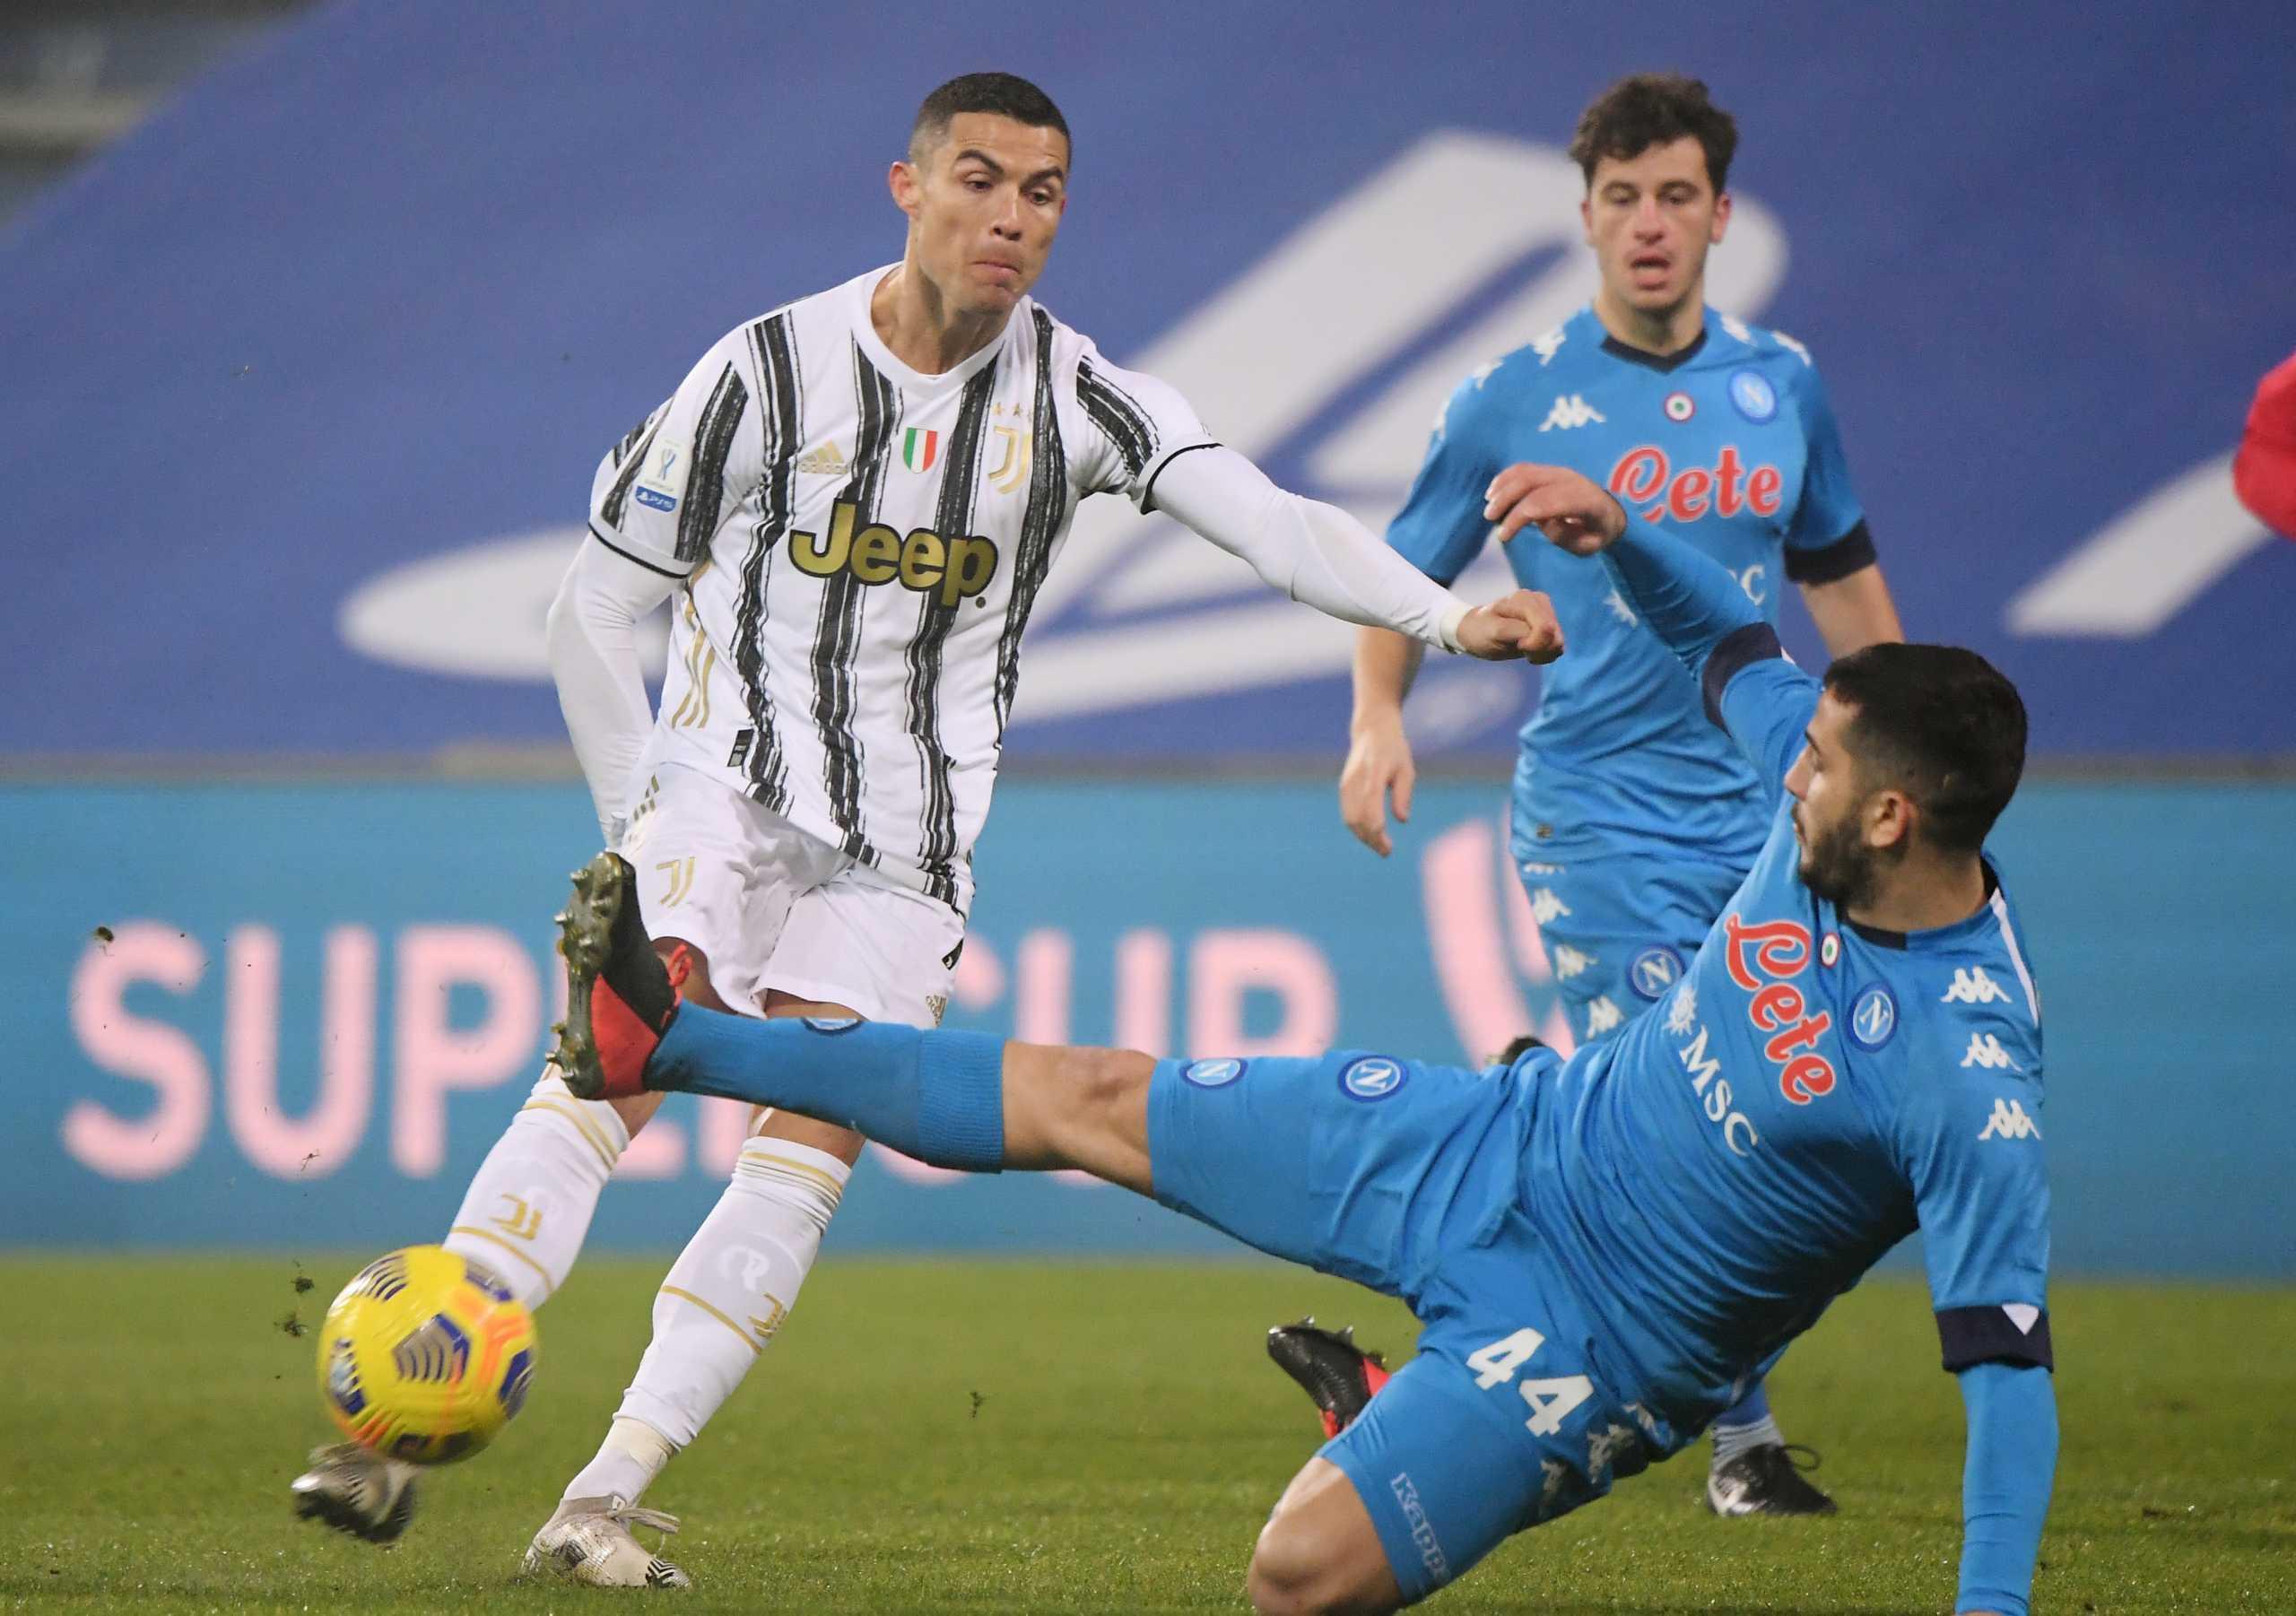 Serie A: Νέα αναβολή στο Γιουβέντους – Νάπολι